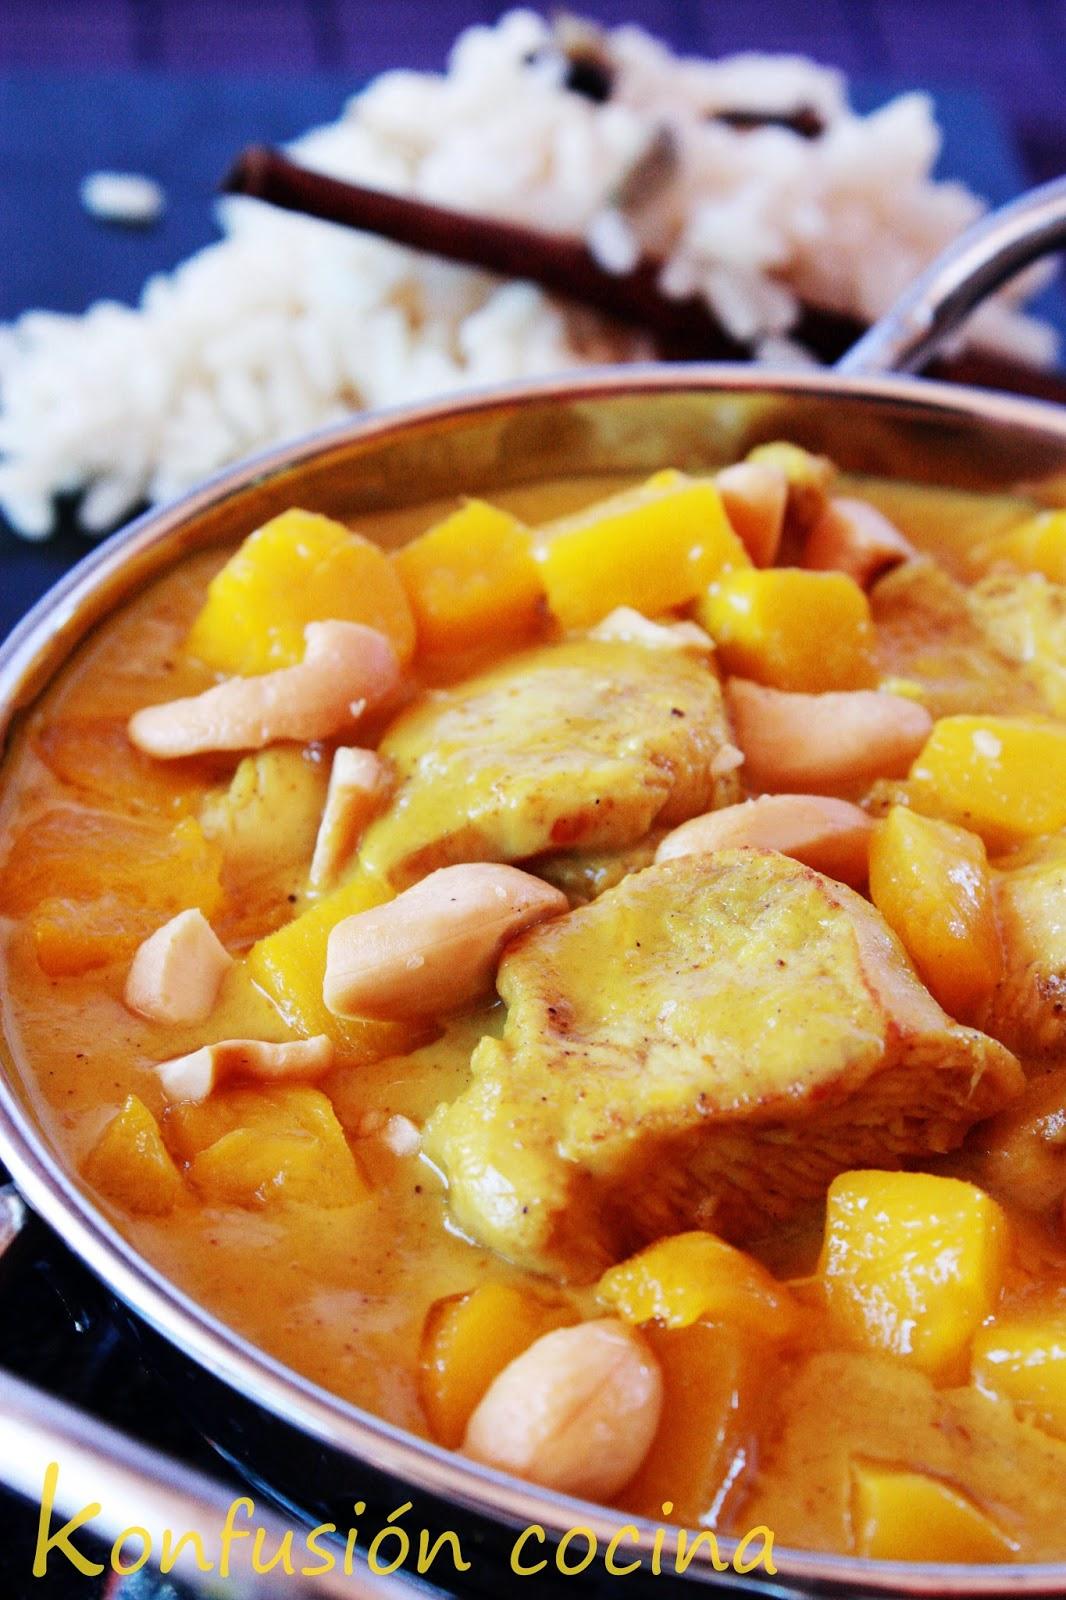 Chicken Curry Kokosmilch leckeren cremigen Würzig indisch ORIENTAL CURRY DI COCCO CREMA deliziosa crema PICCANTE INDIANA DOLCE ORIENTALE süß würzig